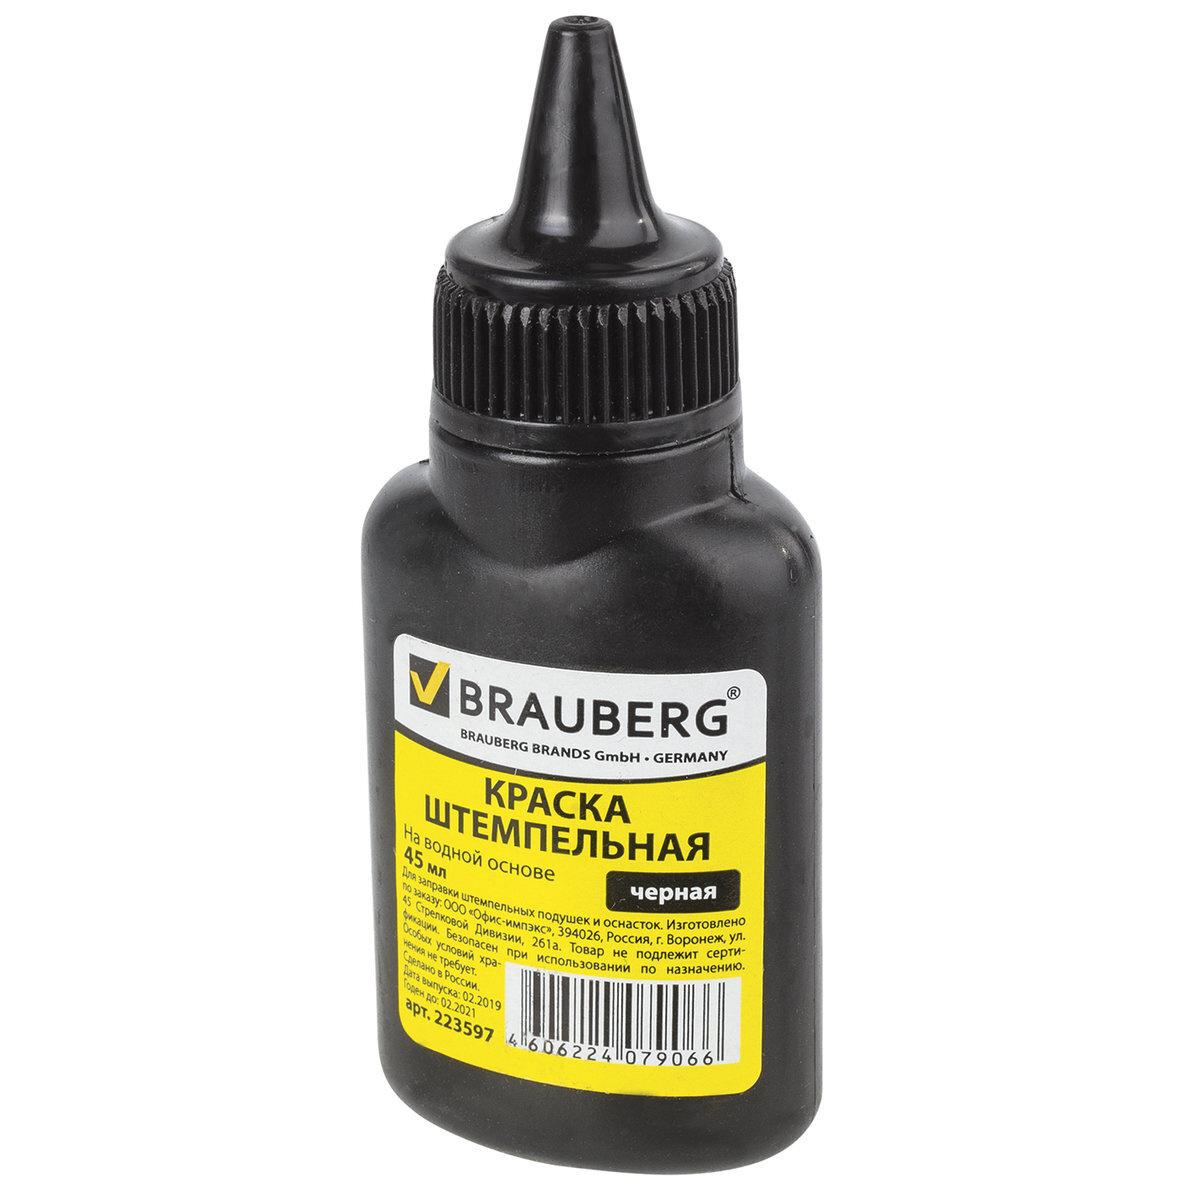 Краска штемпельная Brauberg, черная, 45 мл, на водной основе, 223597  #1